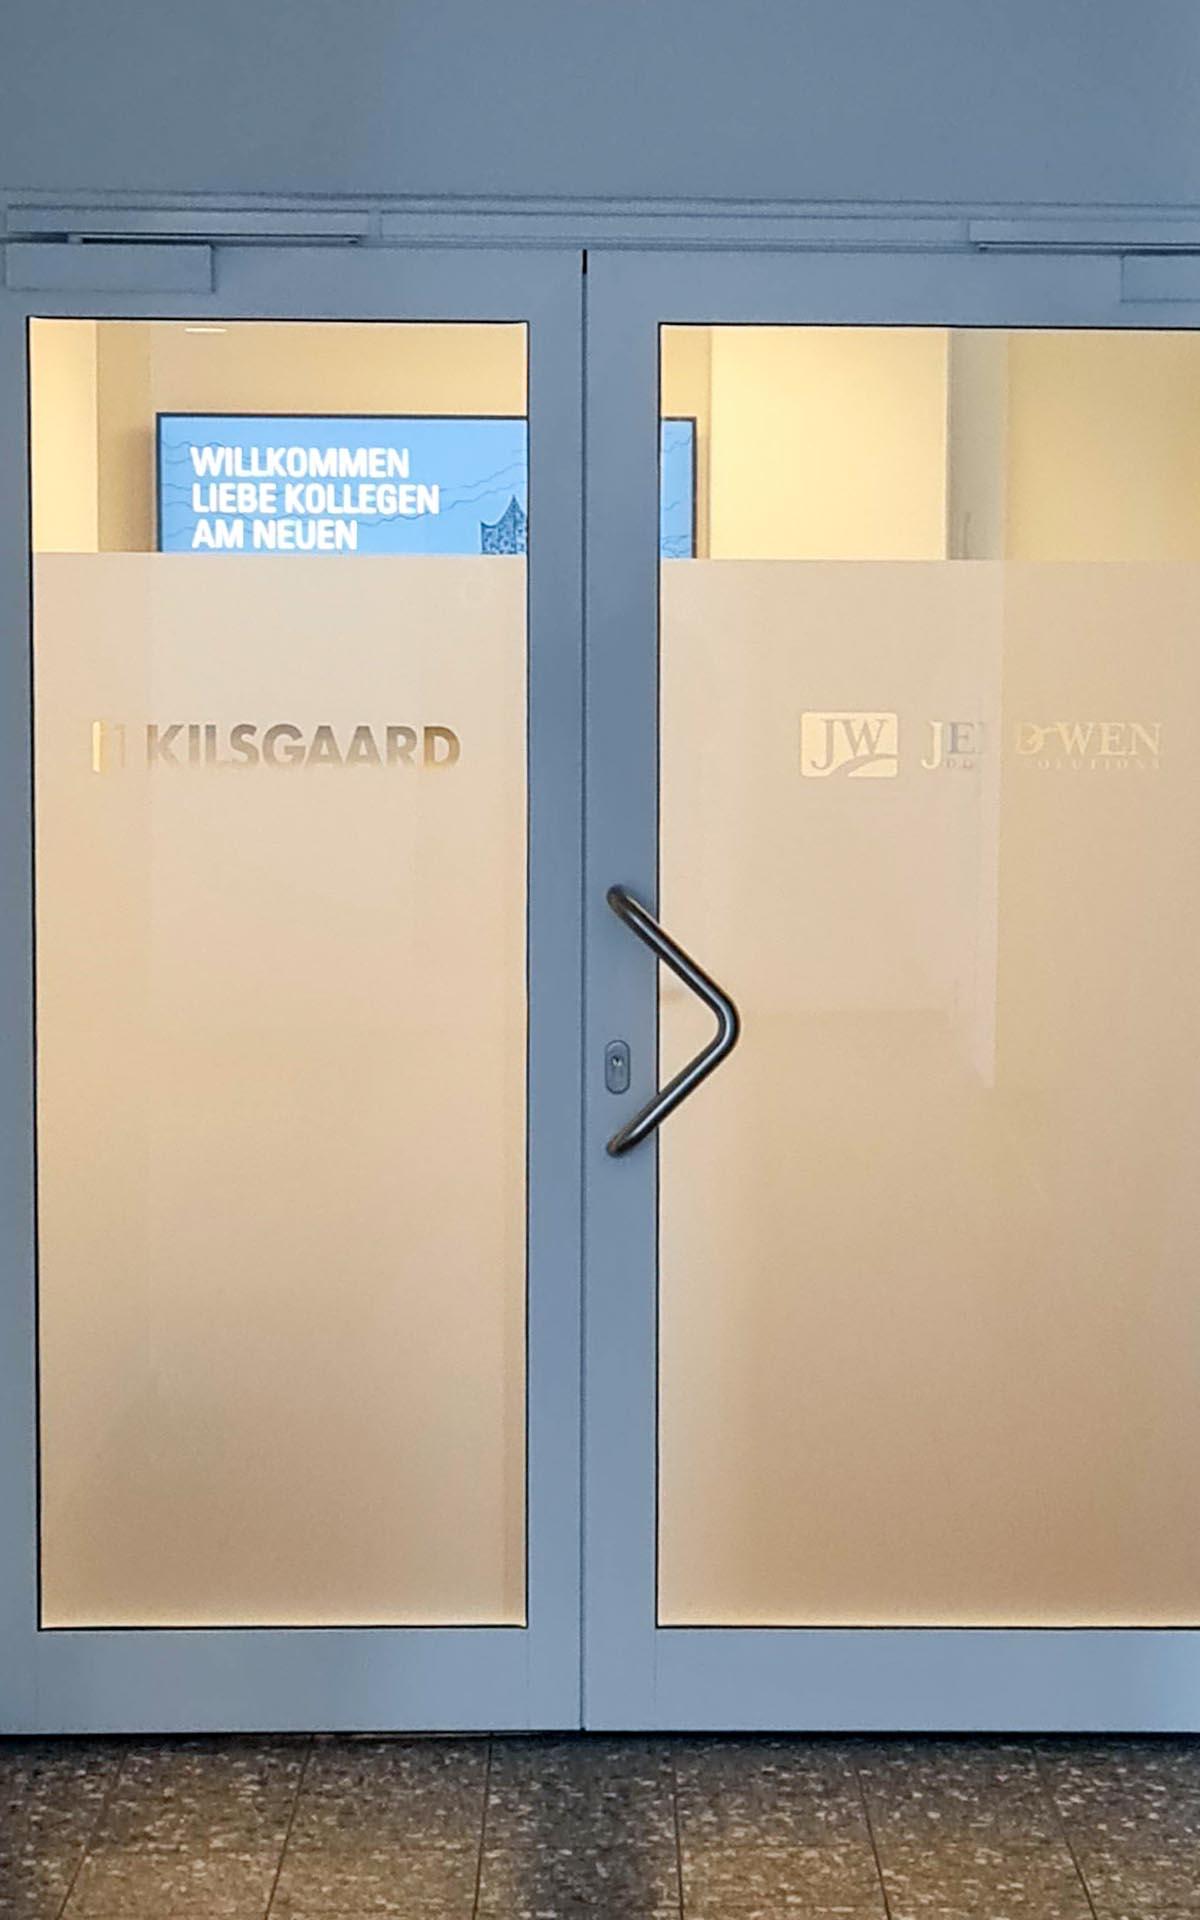 Digital Signage am Büroeingang, außen